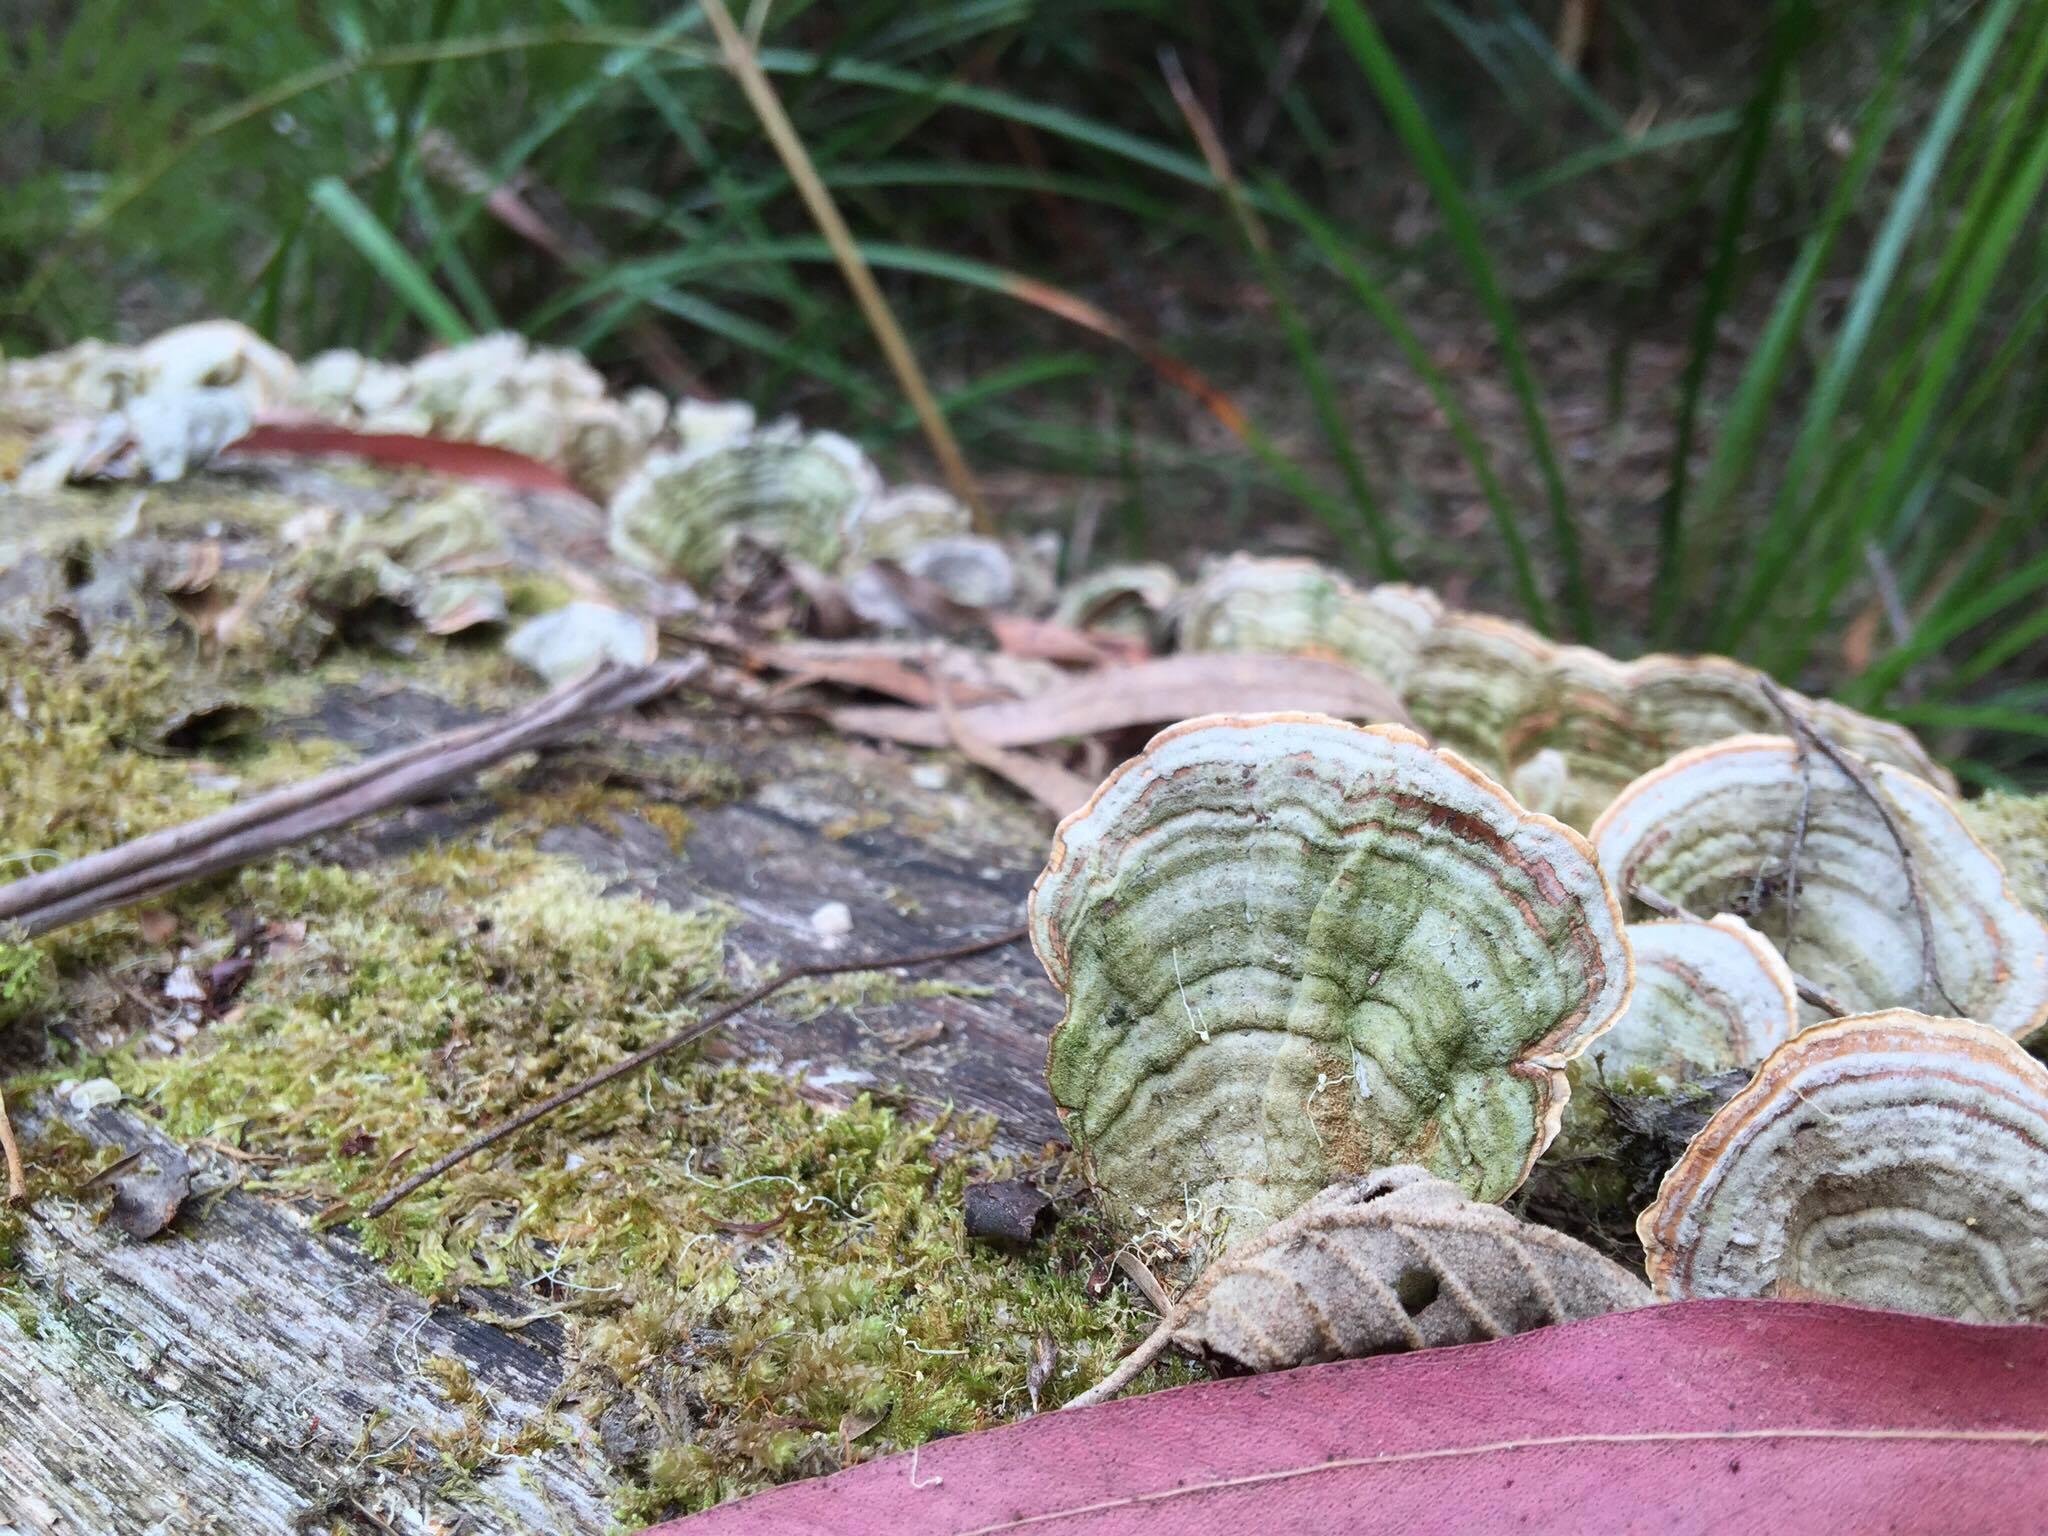 A variety of fungi are abundant along this walk.